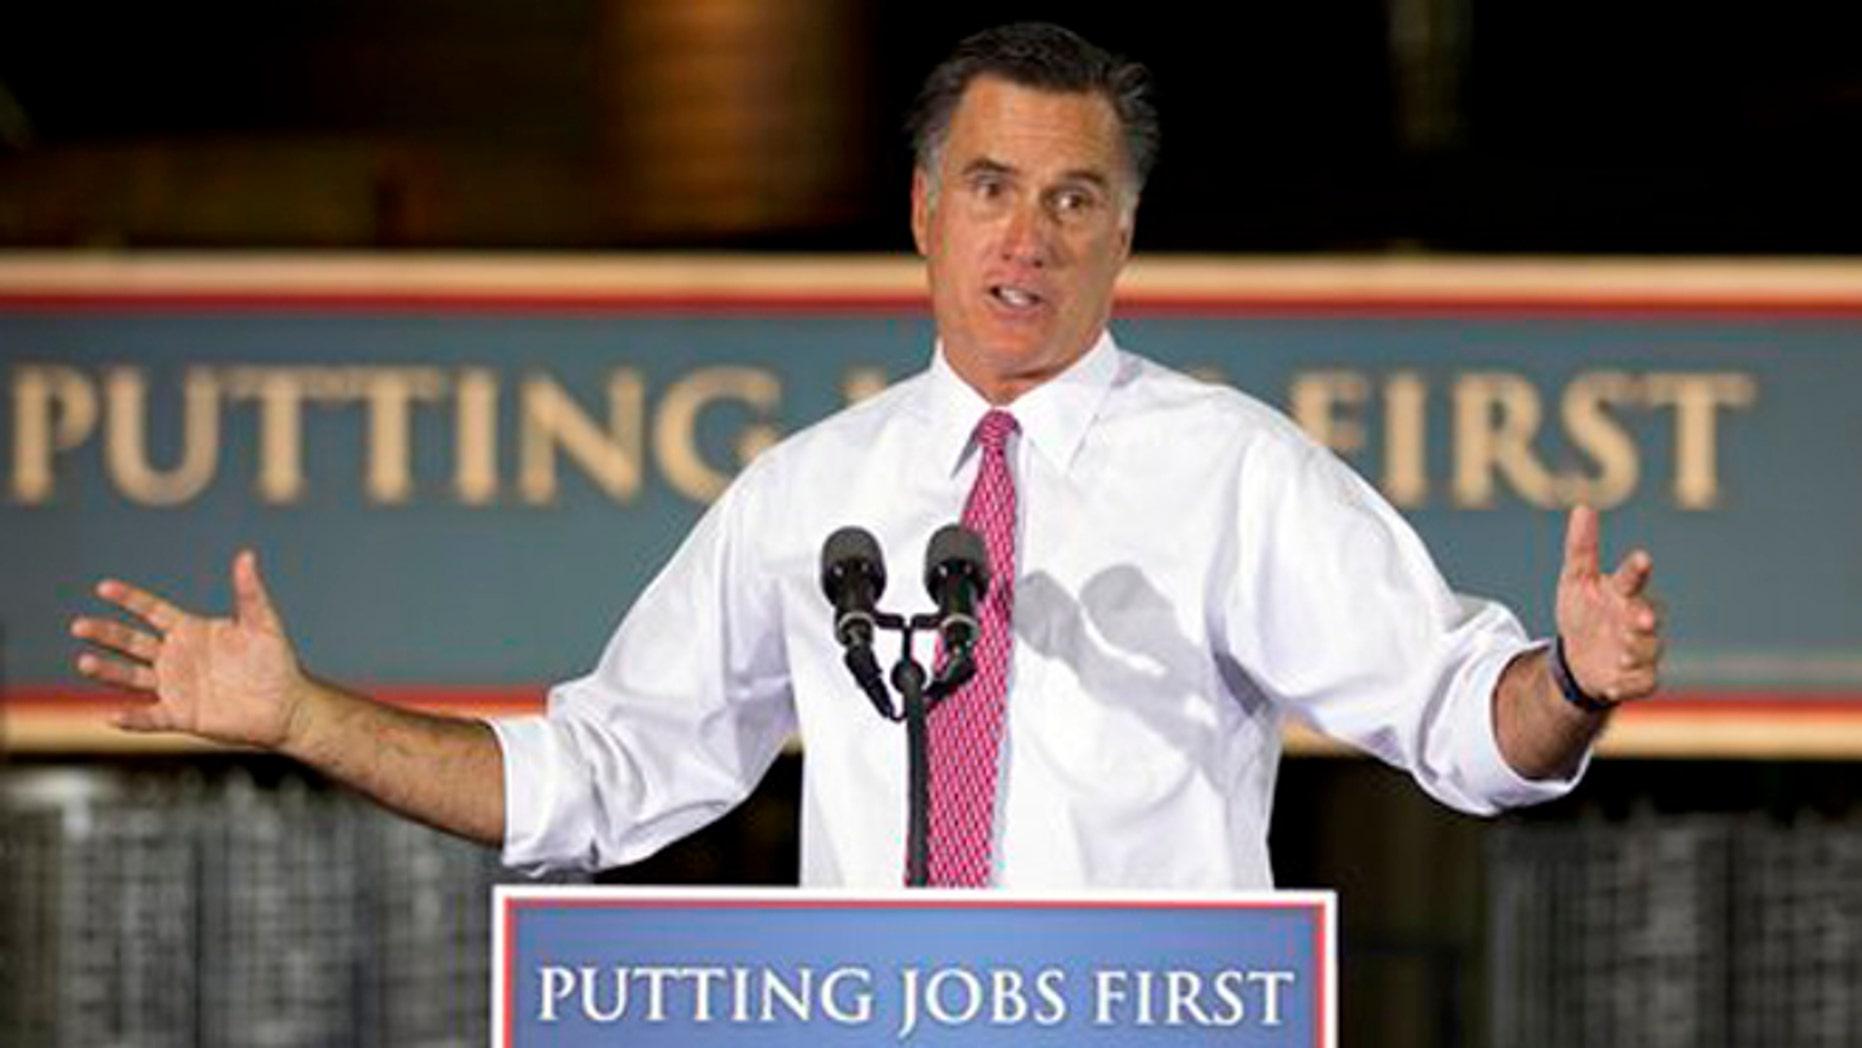 June 14, 2012: GOP presidential candidate Mitt Romney gestures during a campaign stop at Seilkop Industries in Cincinnati, Ohio.